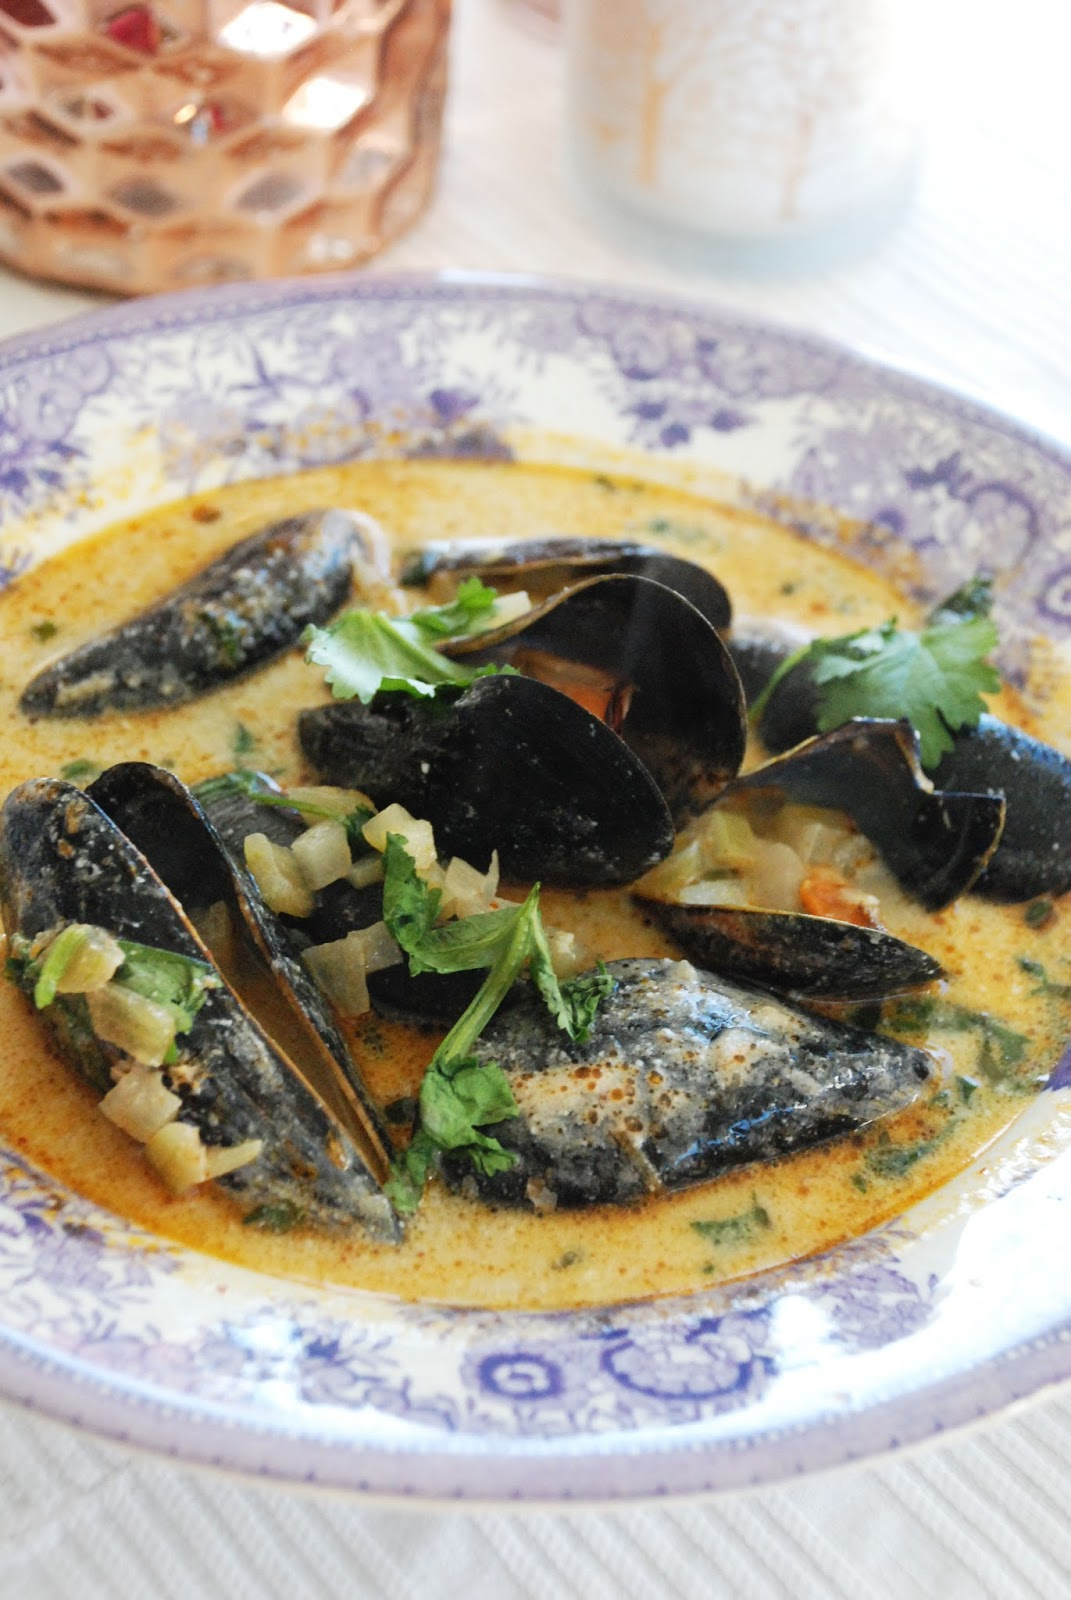 koka musslor tid